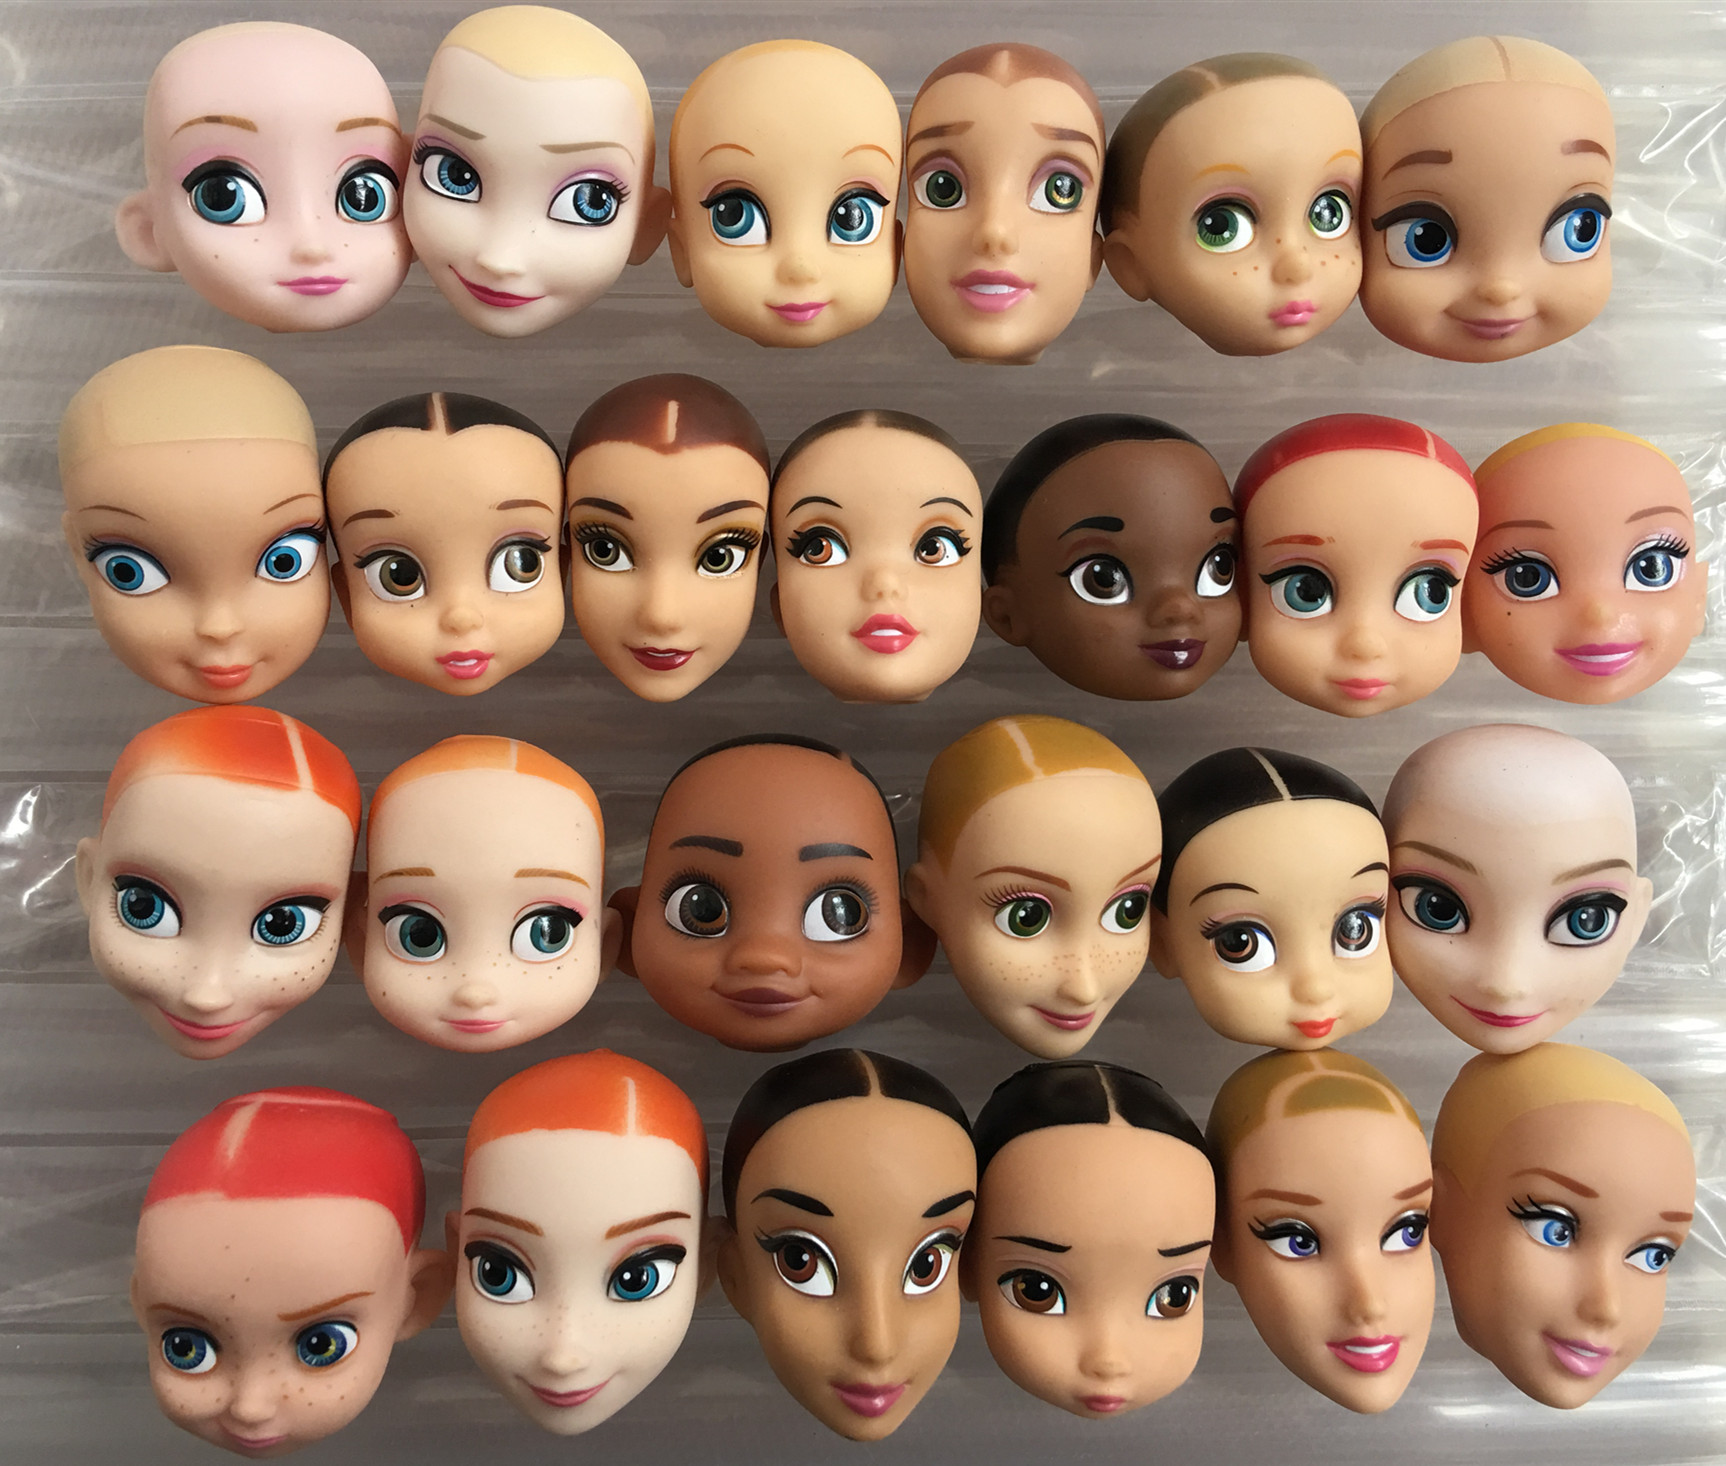 Doll Toy Bald Head No Hair Princess Heads Mermaid Elsa Baby Doll Cute Smiles Doll Heads DIY Plants Hair Head Girls Doll Heads